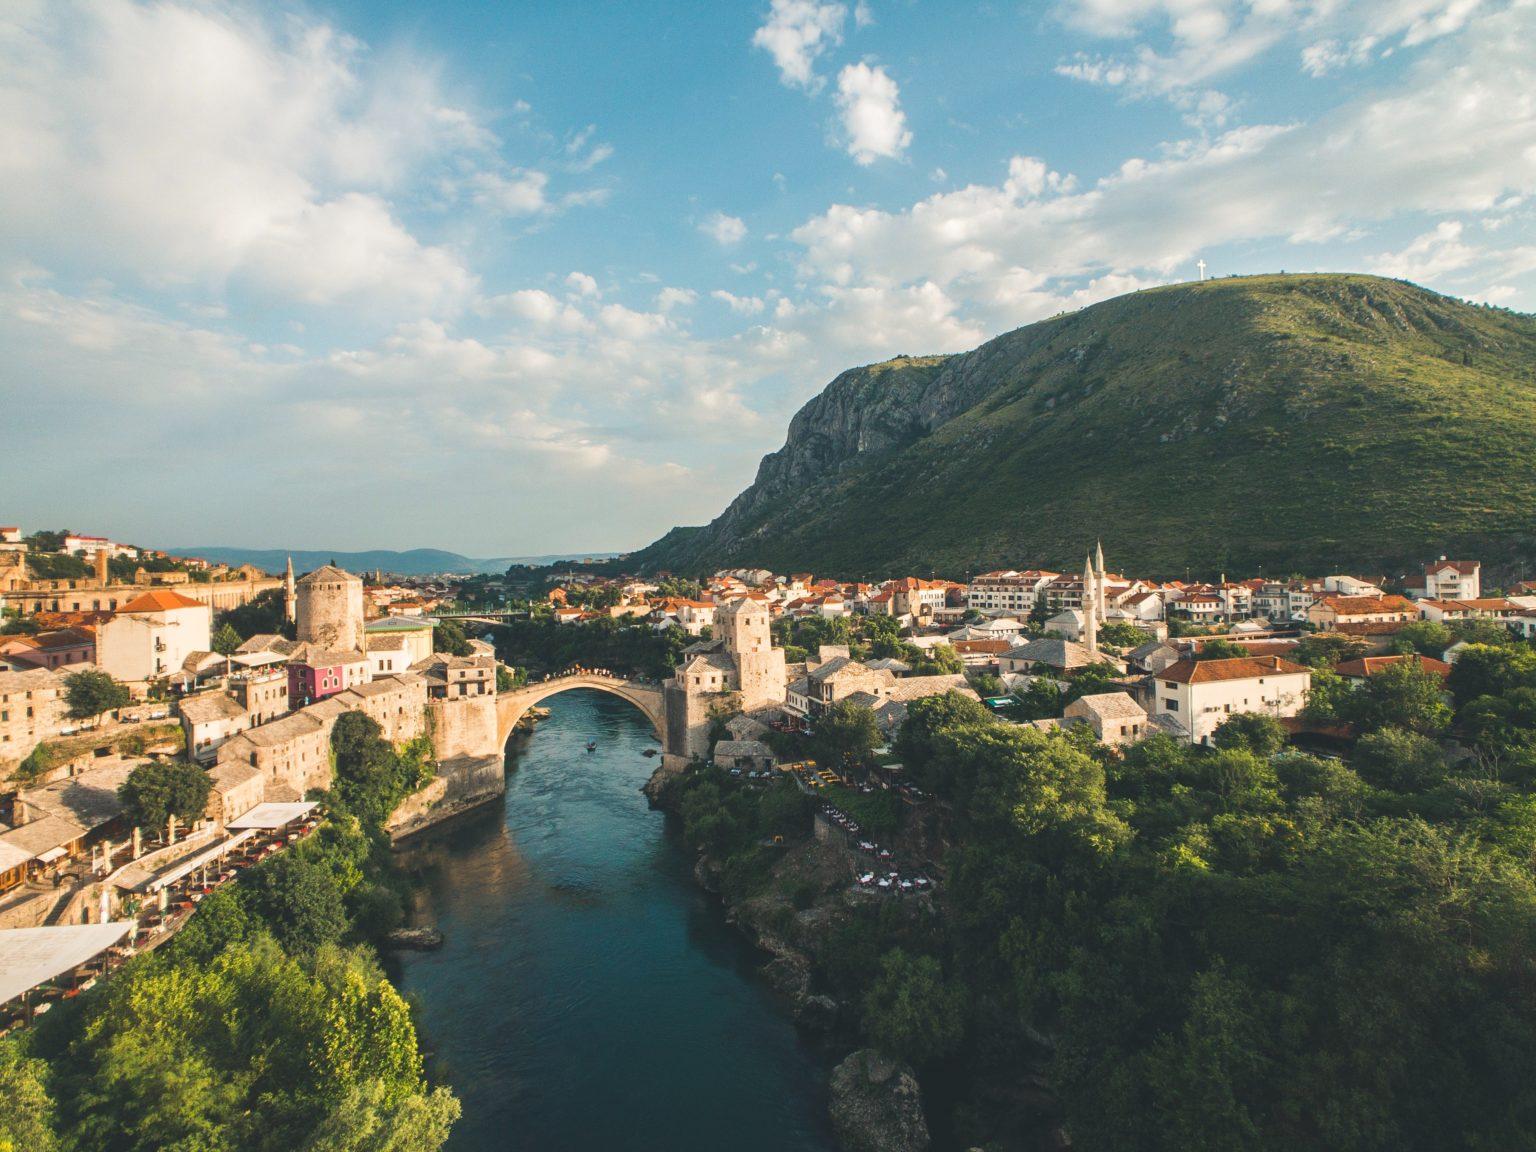 Mostaras prie Neretvos upės